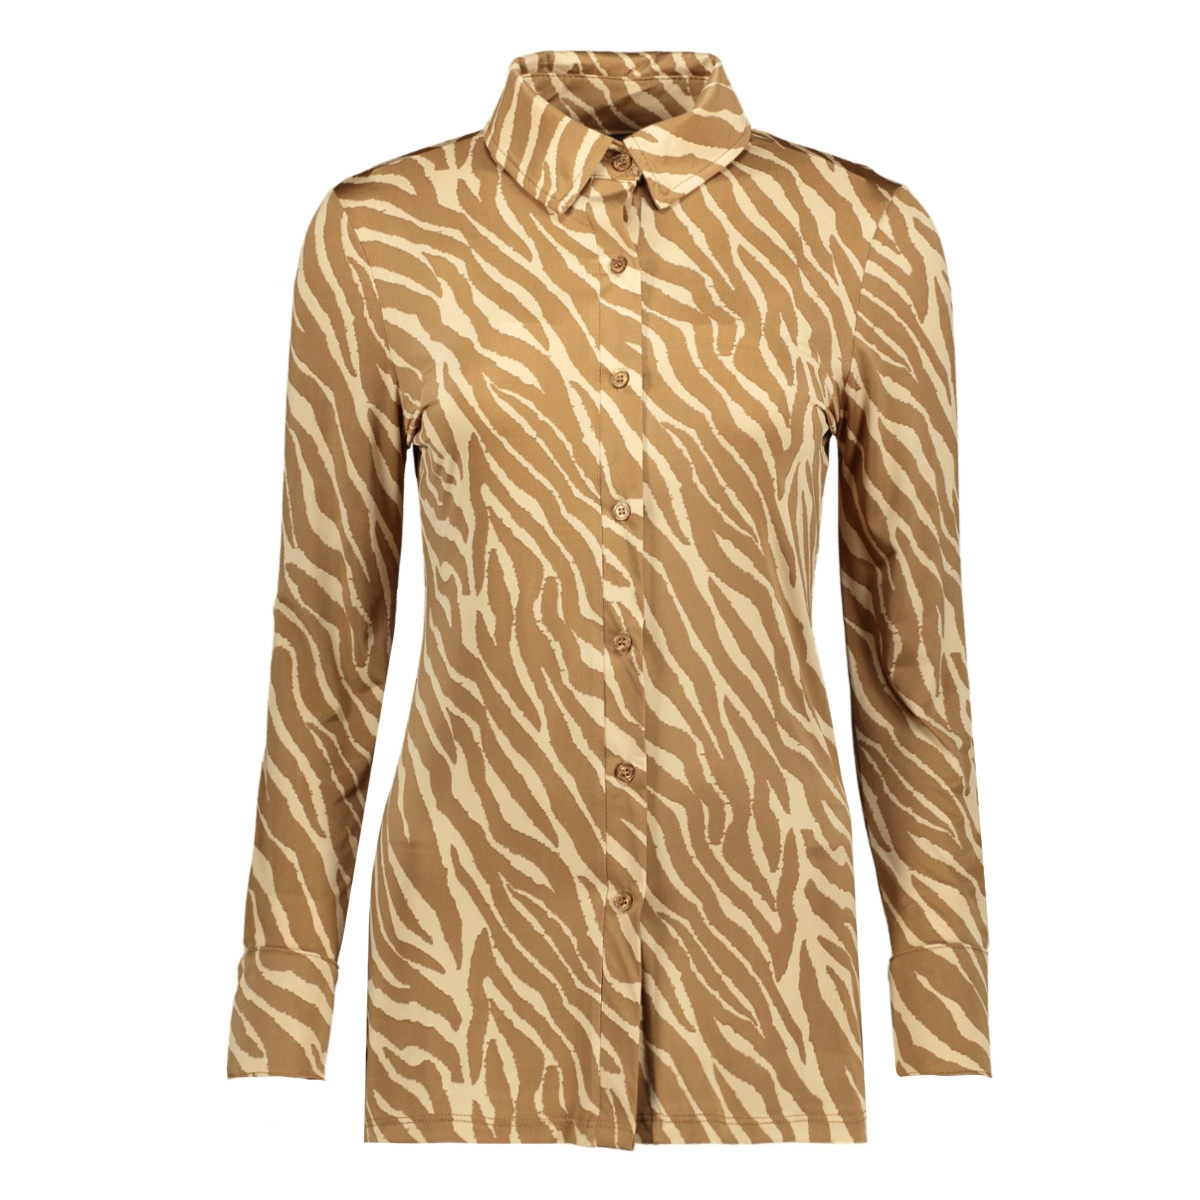 blouse basic 3332 iz naiz blouse zebra camel/sand